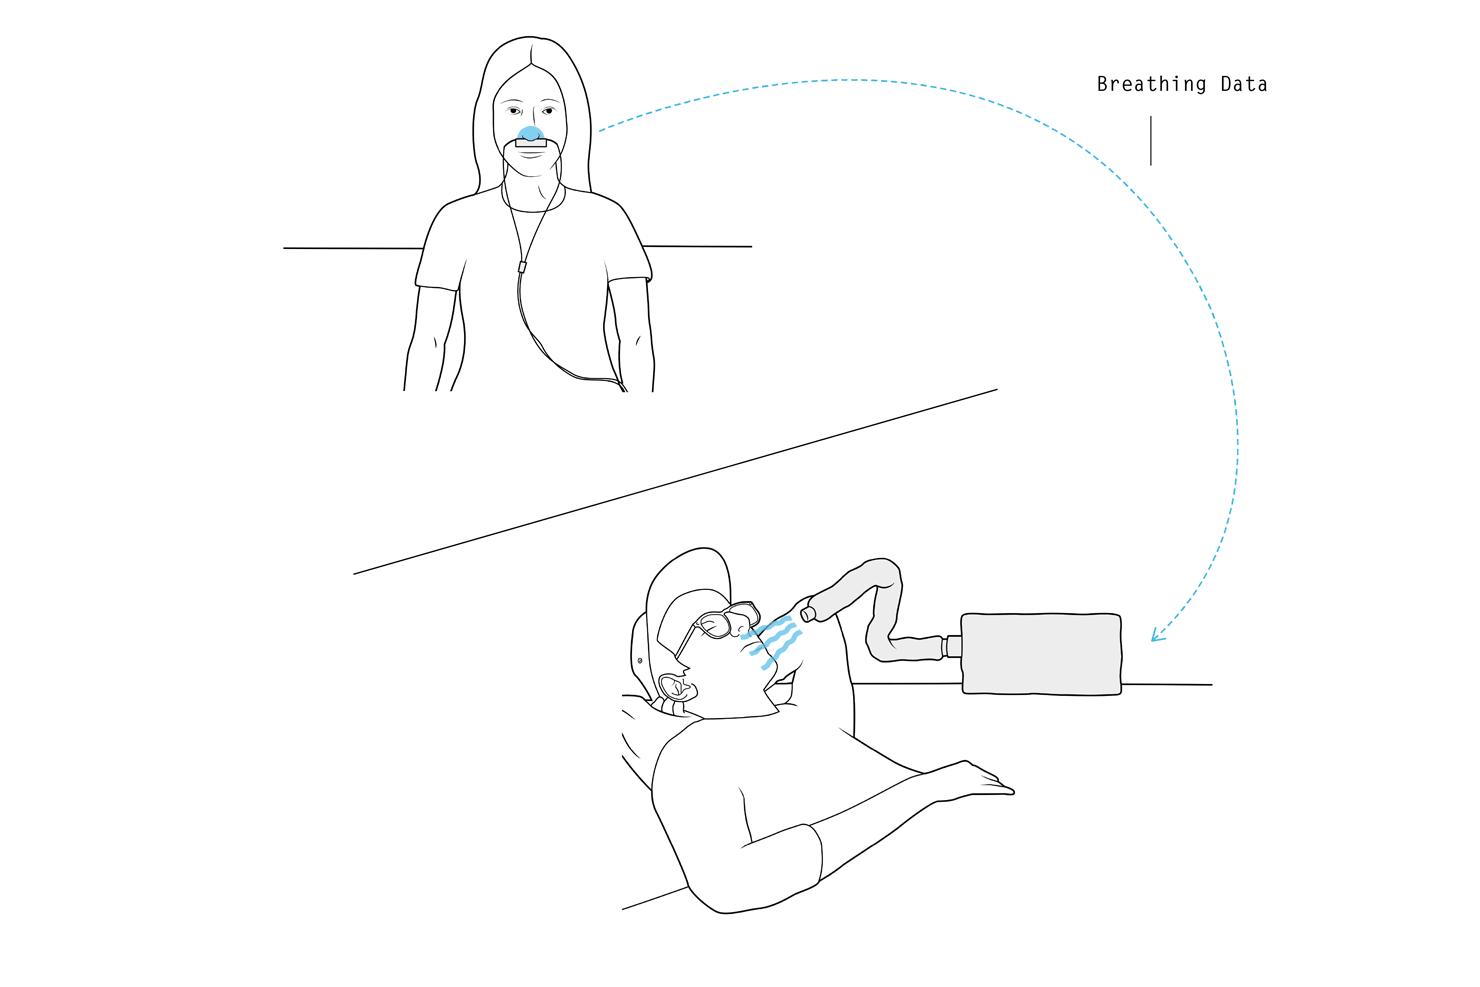 Breathing Apparatus,